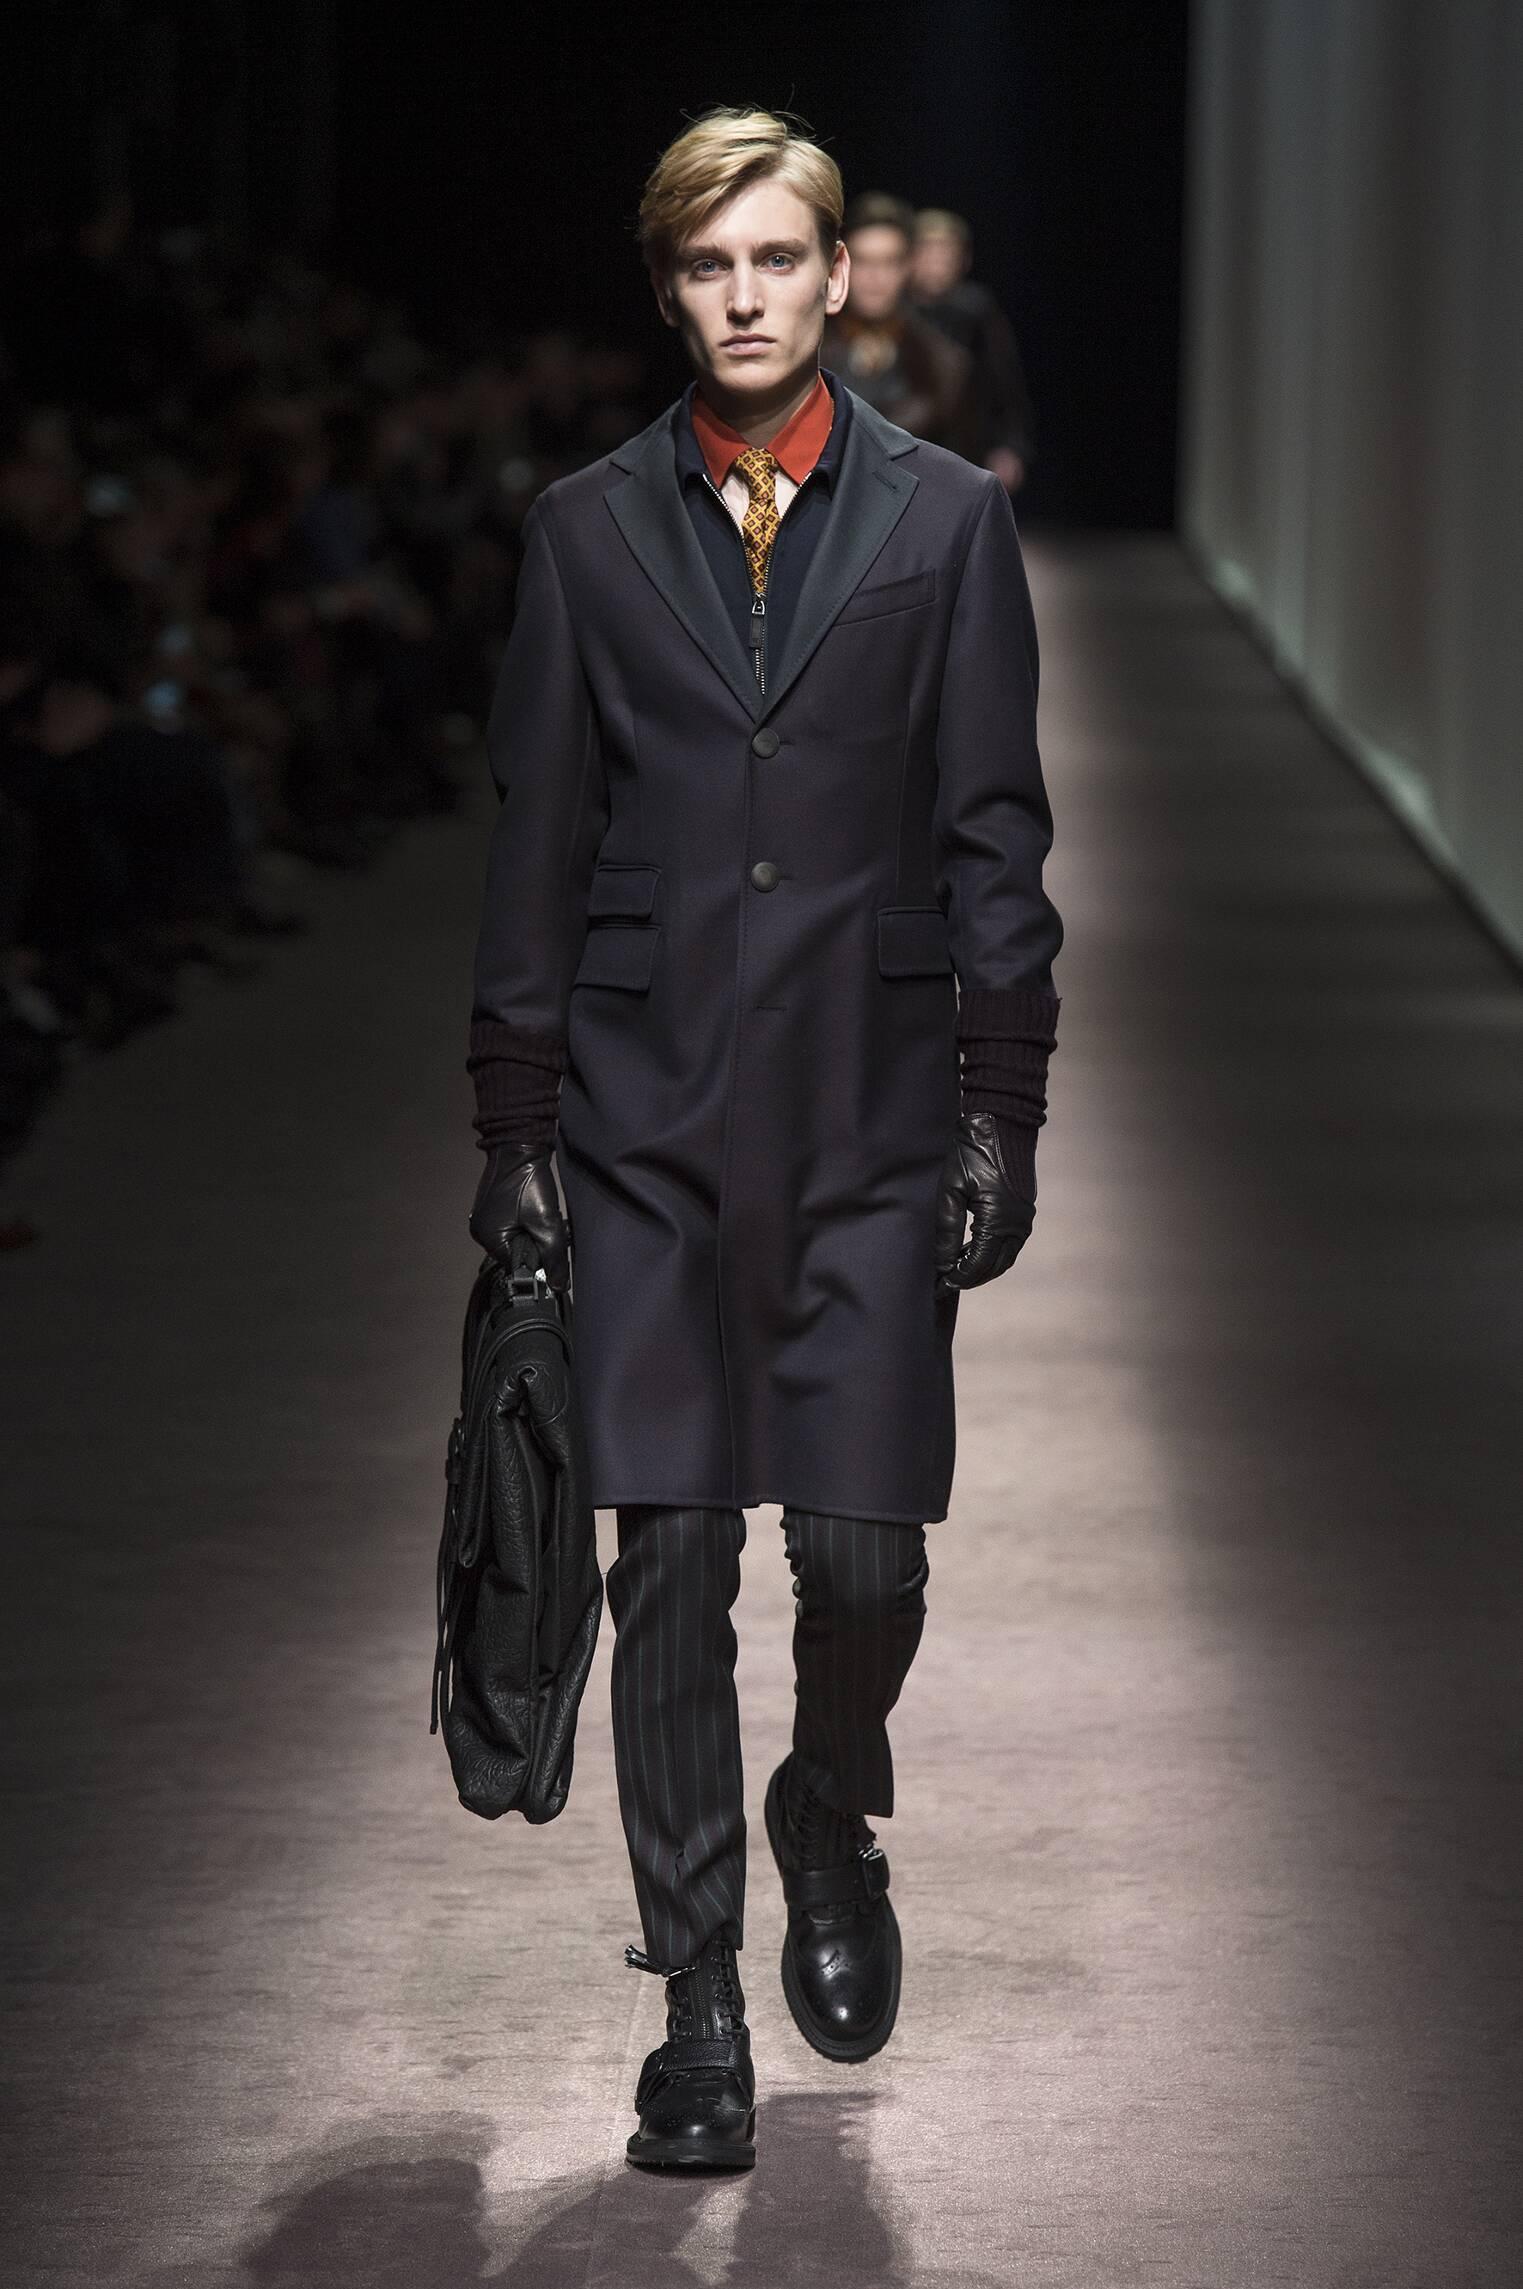 Fashion Model Canali Catwalk